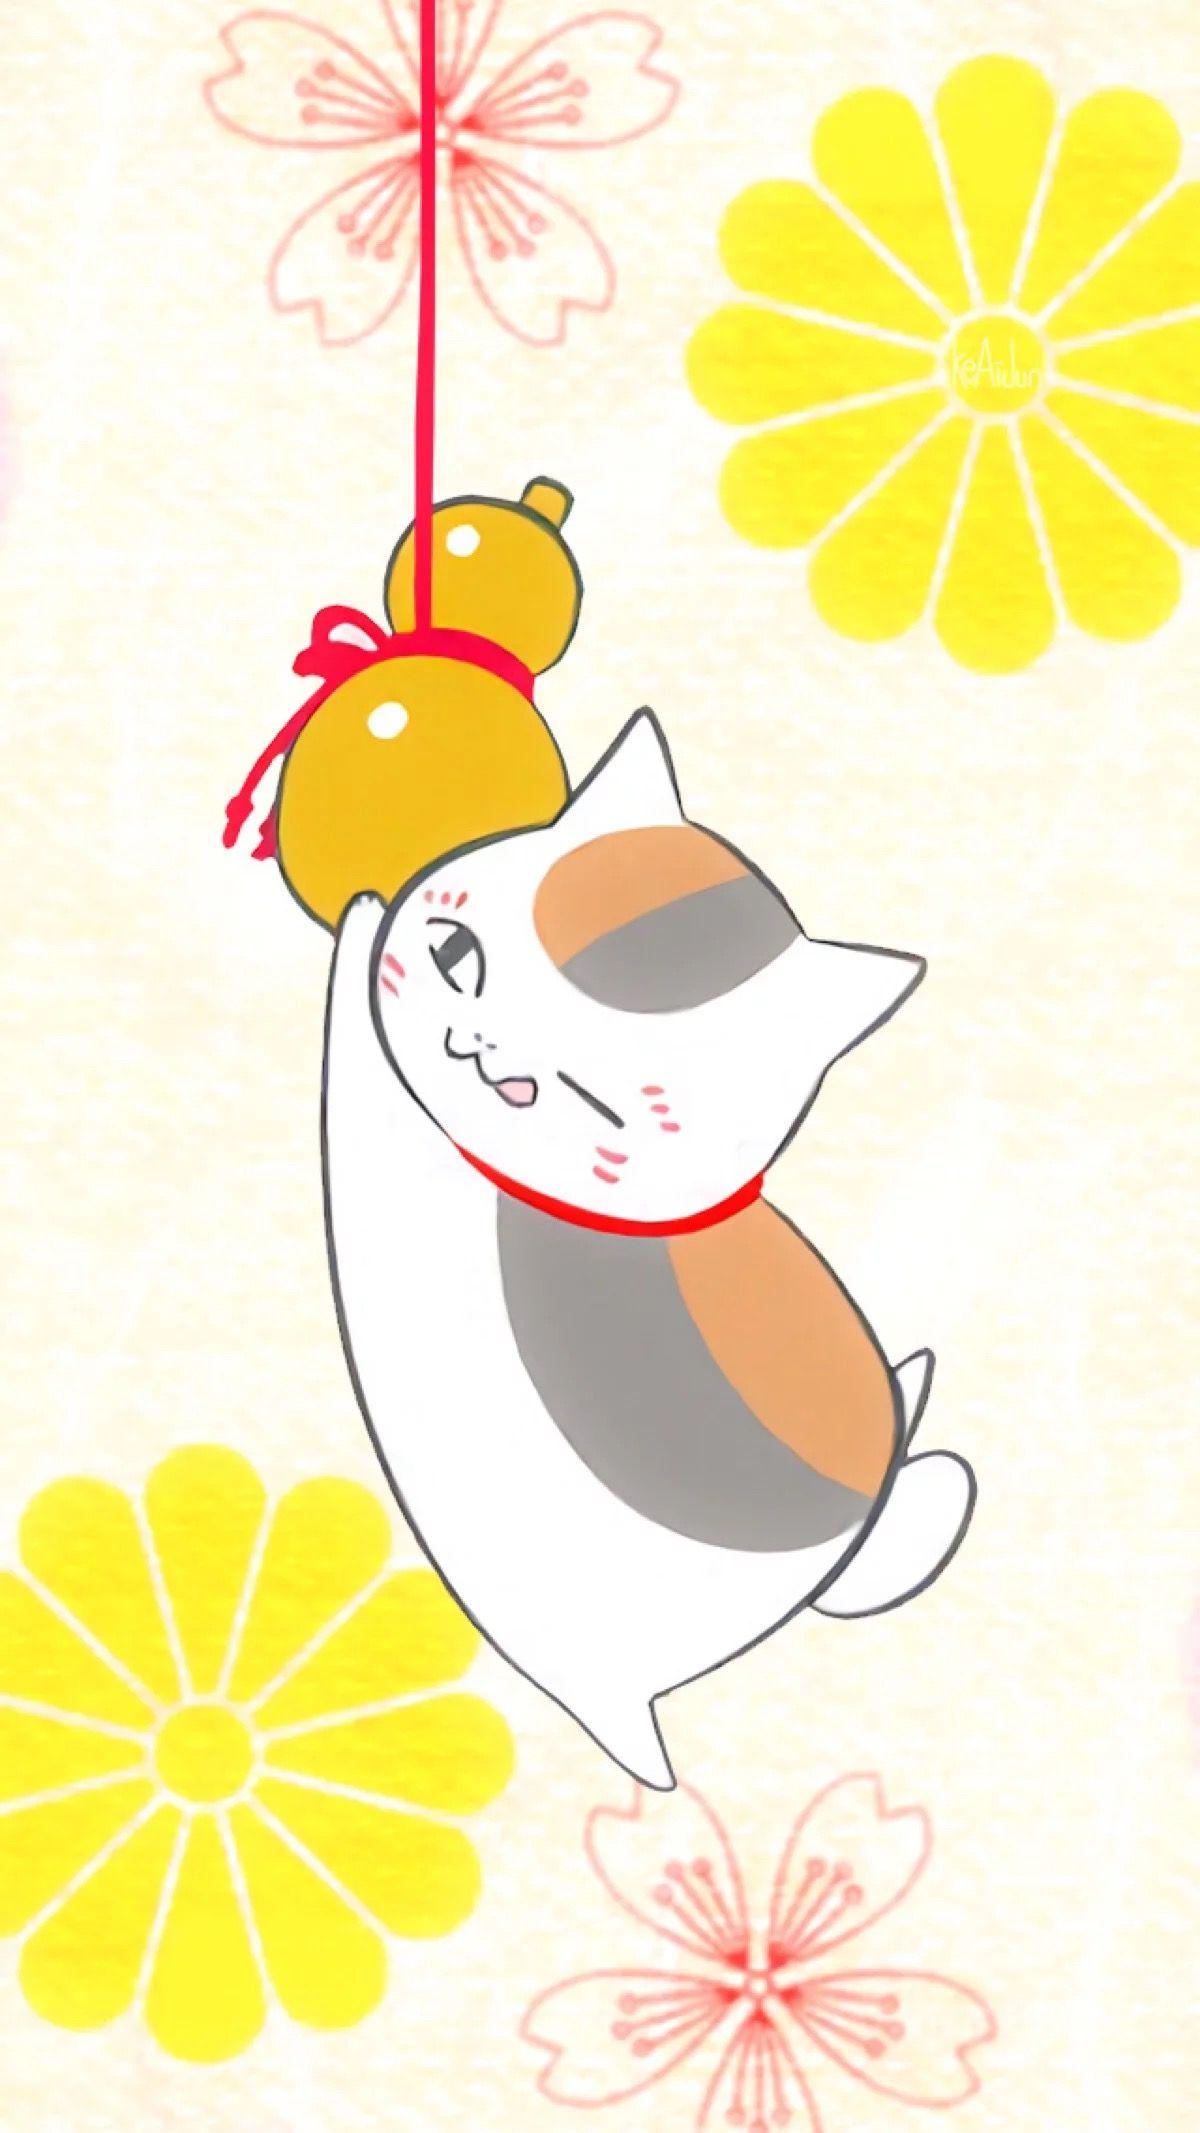 Anime 3 おしゃれまとめの人気アイデア Pinterest Hilary Casey 夏目友人帳 アニメ 夏目友人帳 イラスト にゃんこ先生